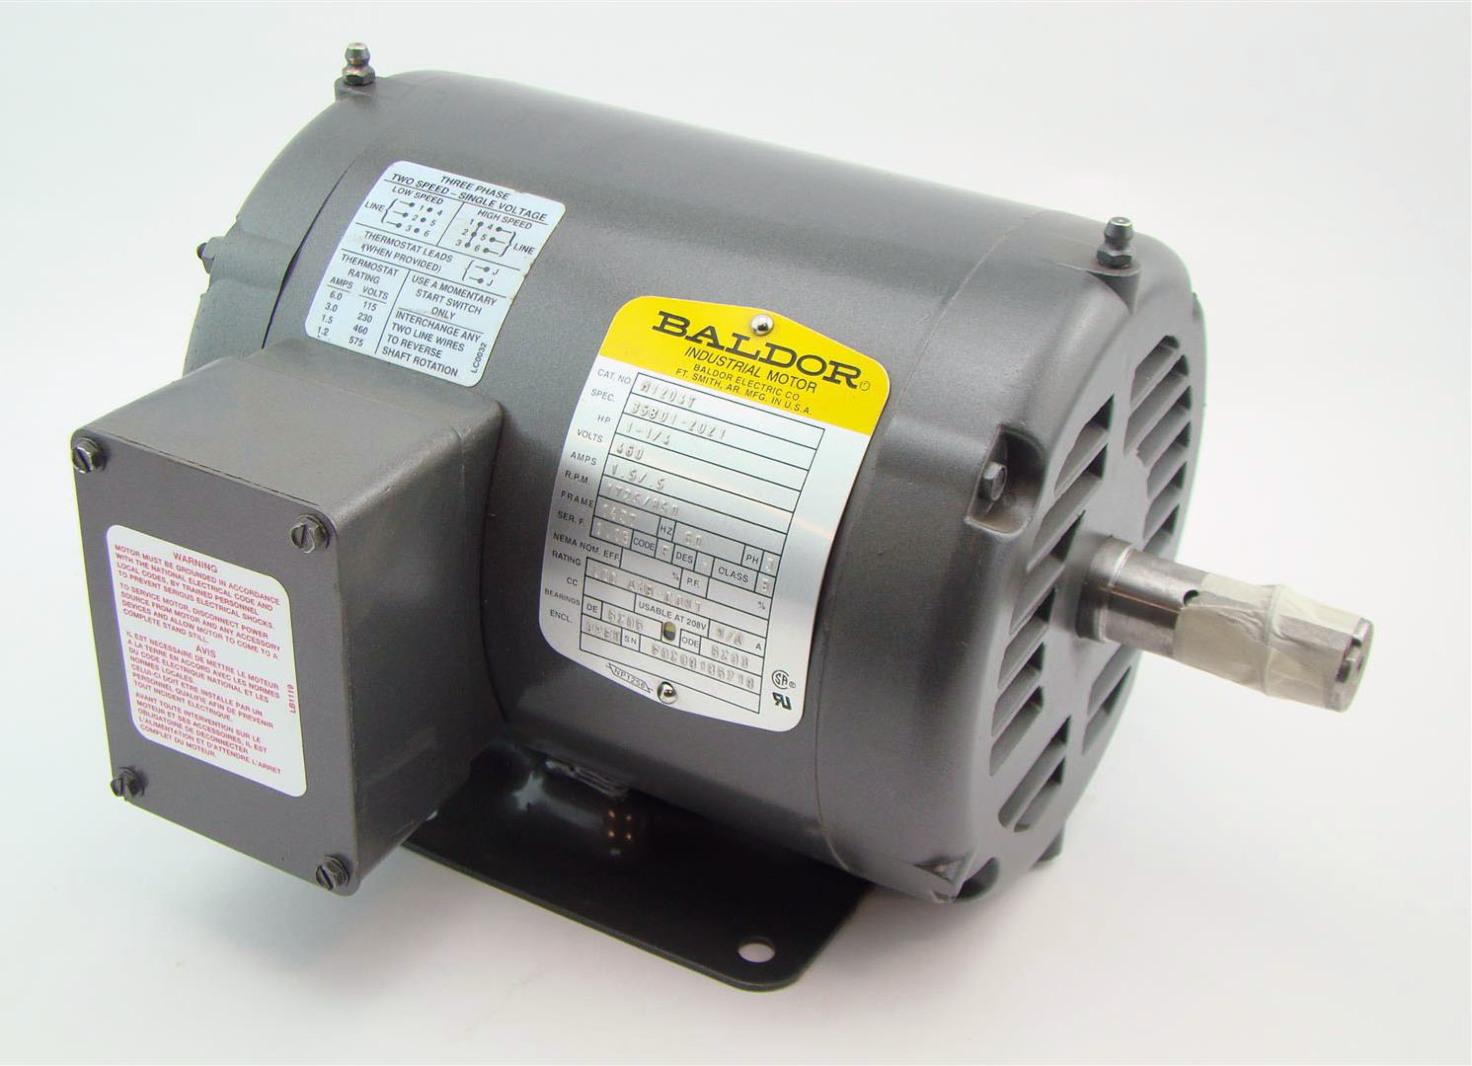 Baldor 1 1 4hp Electric Motor 1725rpm 460v M1204t Joseph